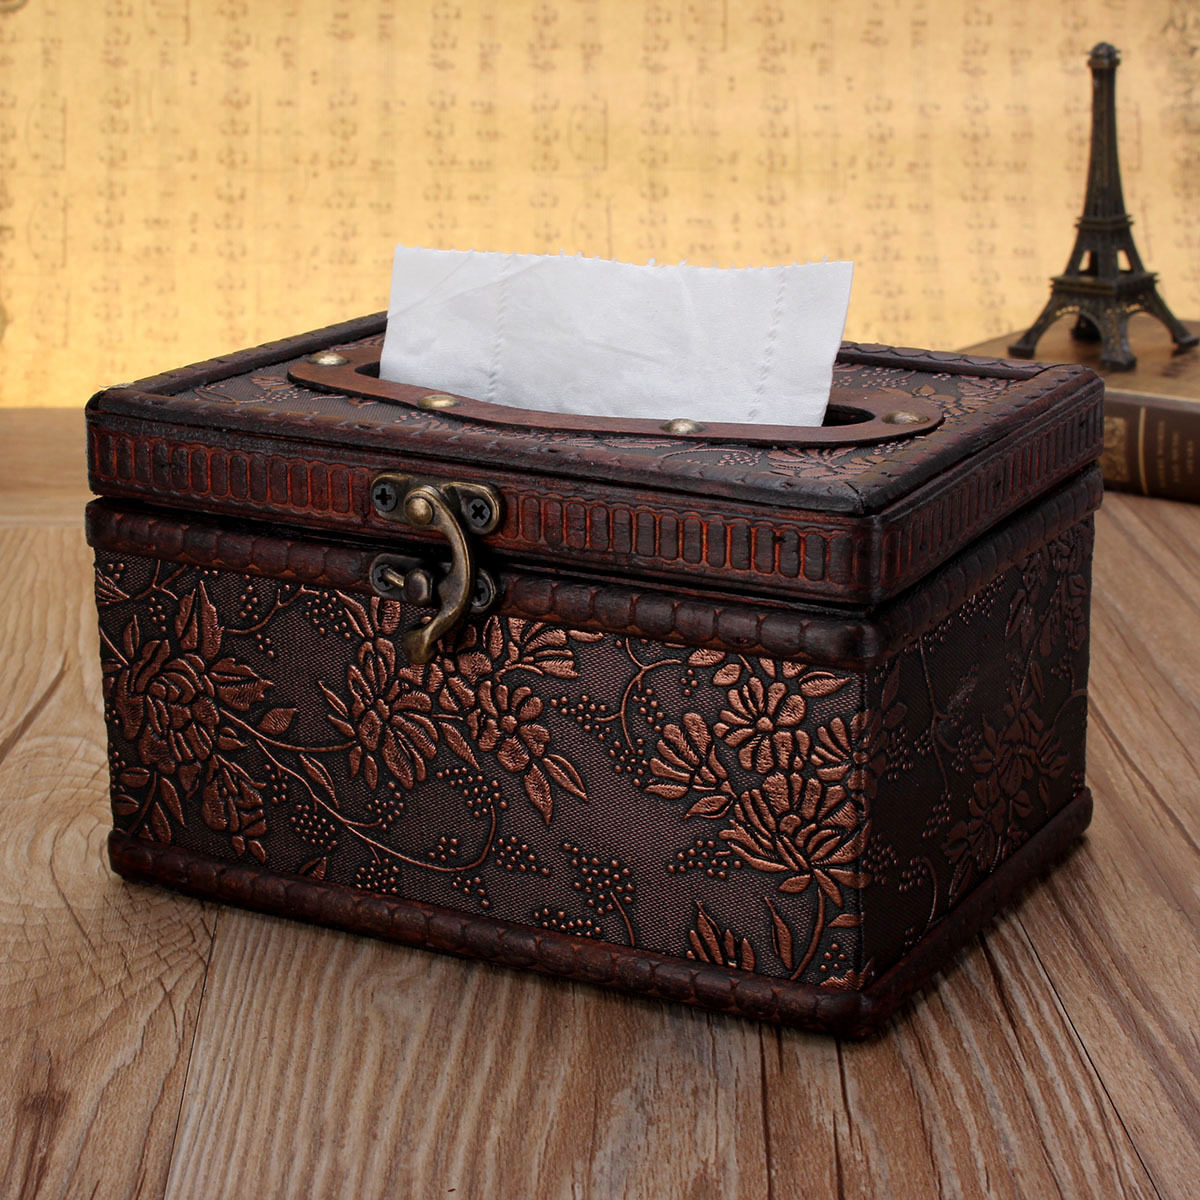 bo te bijoux bois ancienne rangement tr sor coffret ecrin collection stockage ebay. Black Bedroom Furniture Sets. Home Design Ideas